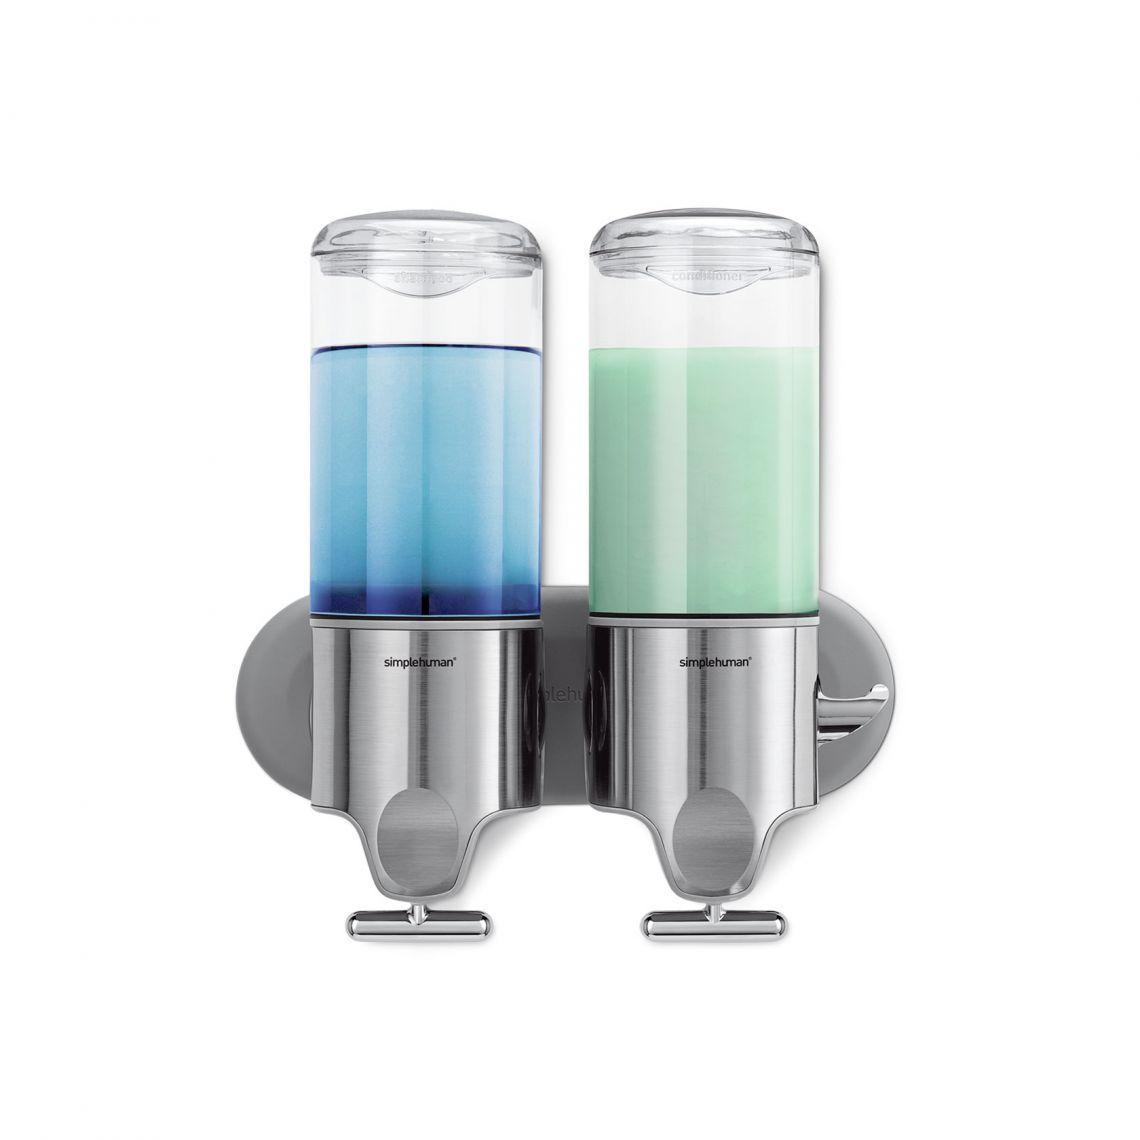 Single Double Tube Soap Shower Gel Shampoo Bathroom Pump Dispenser Wall Mounted